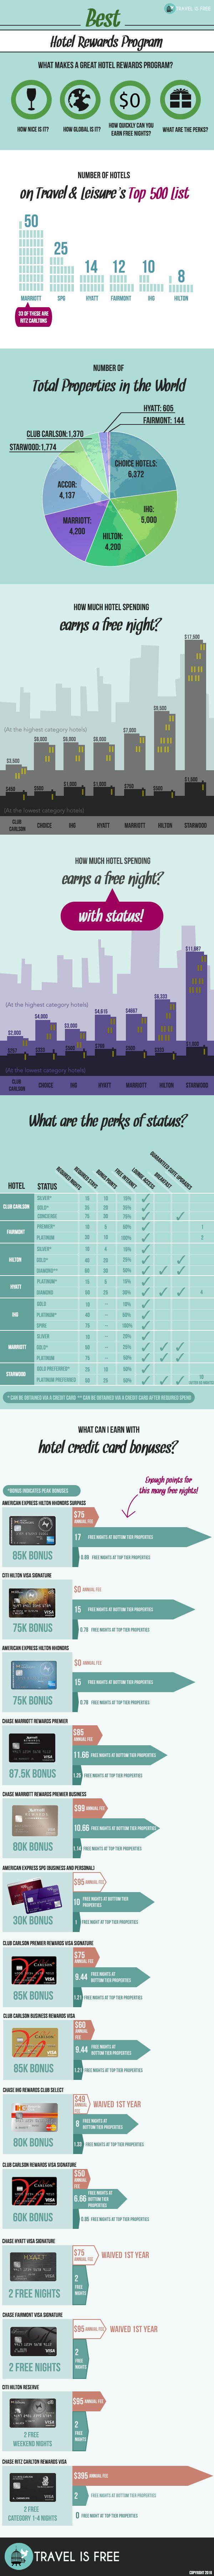 "infographic] ""Best Hotel Rewards program"" Feb-2016 by Travelisfree.com"